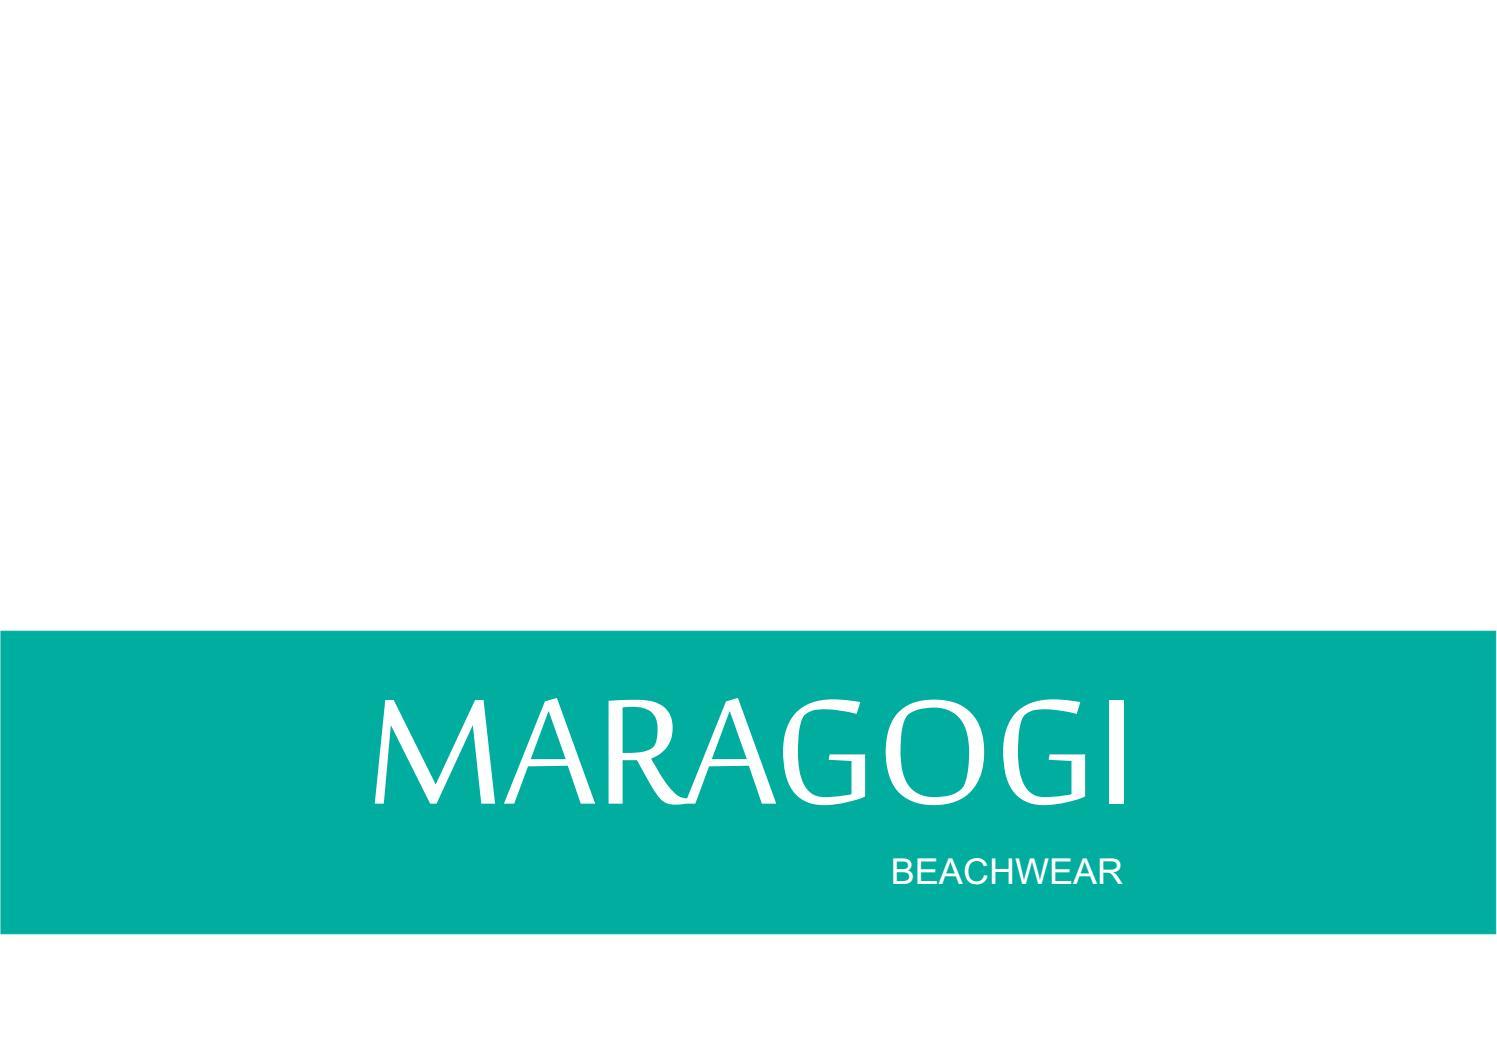 91902a629d MARAGOGI - Jessica Braga by Una Trendsetters - issuu